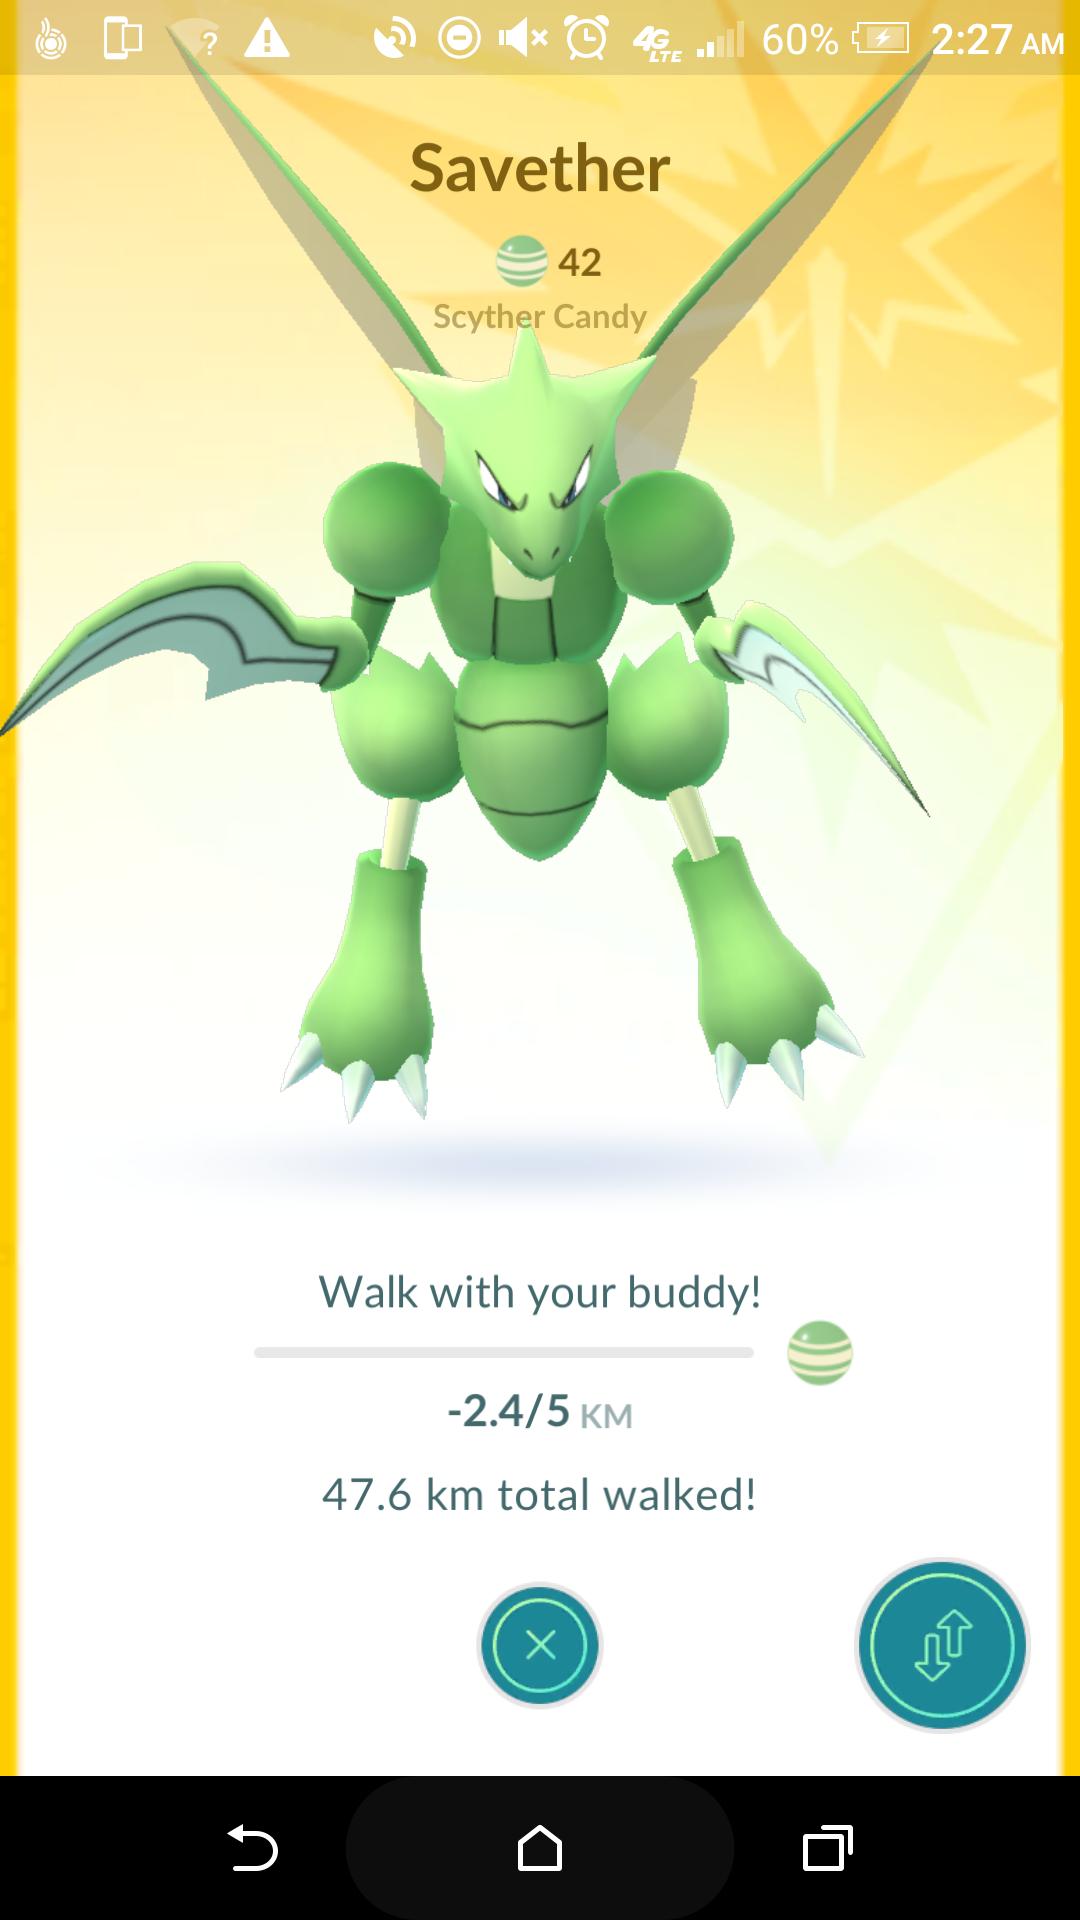 [Bug]My scyther buddy is getting negative walking distance.